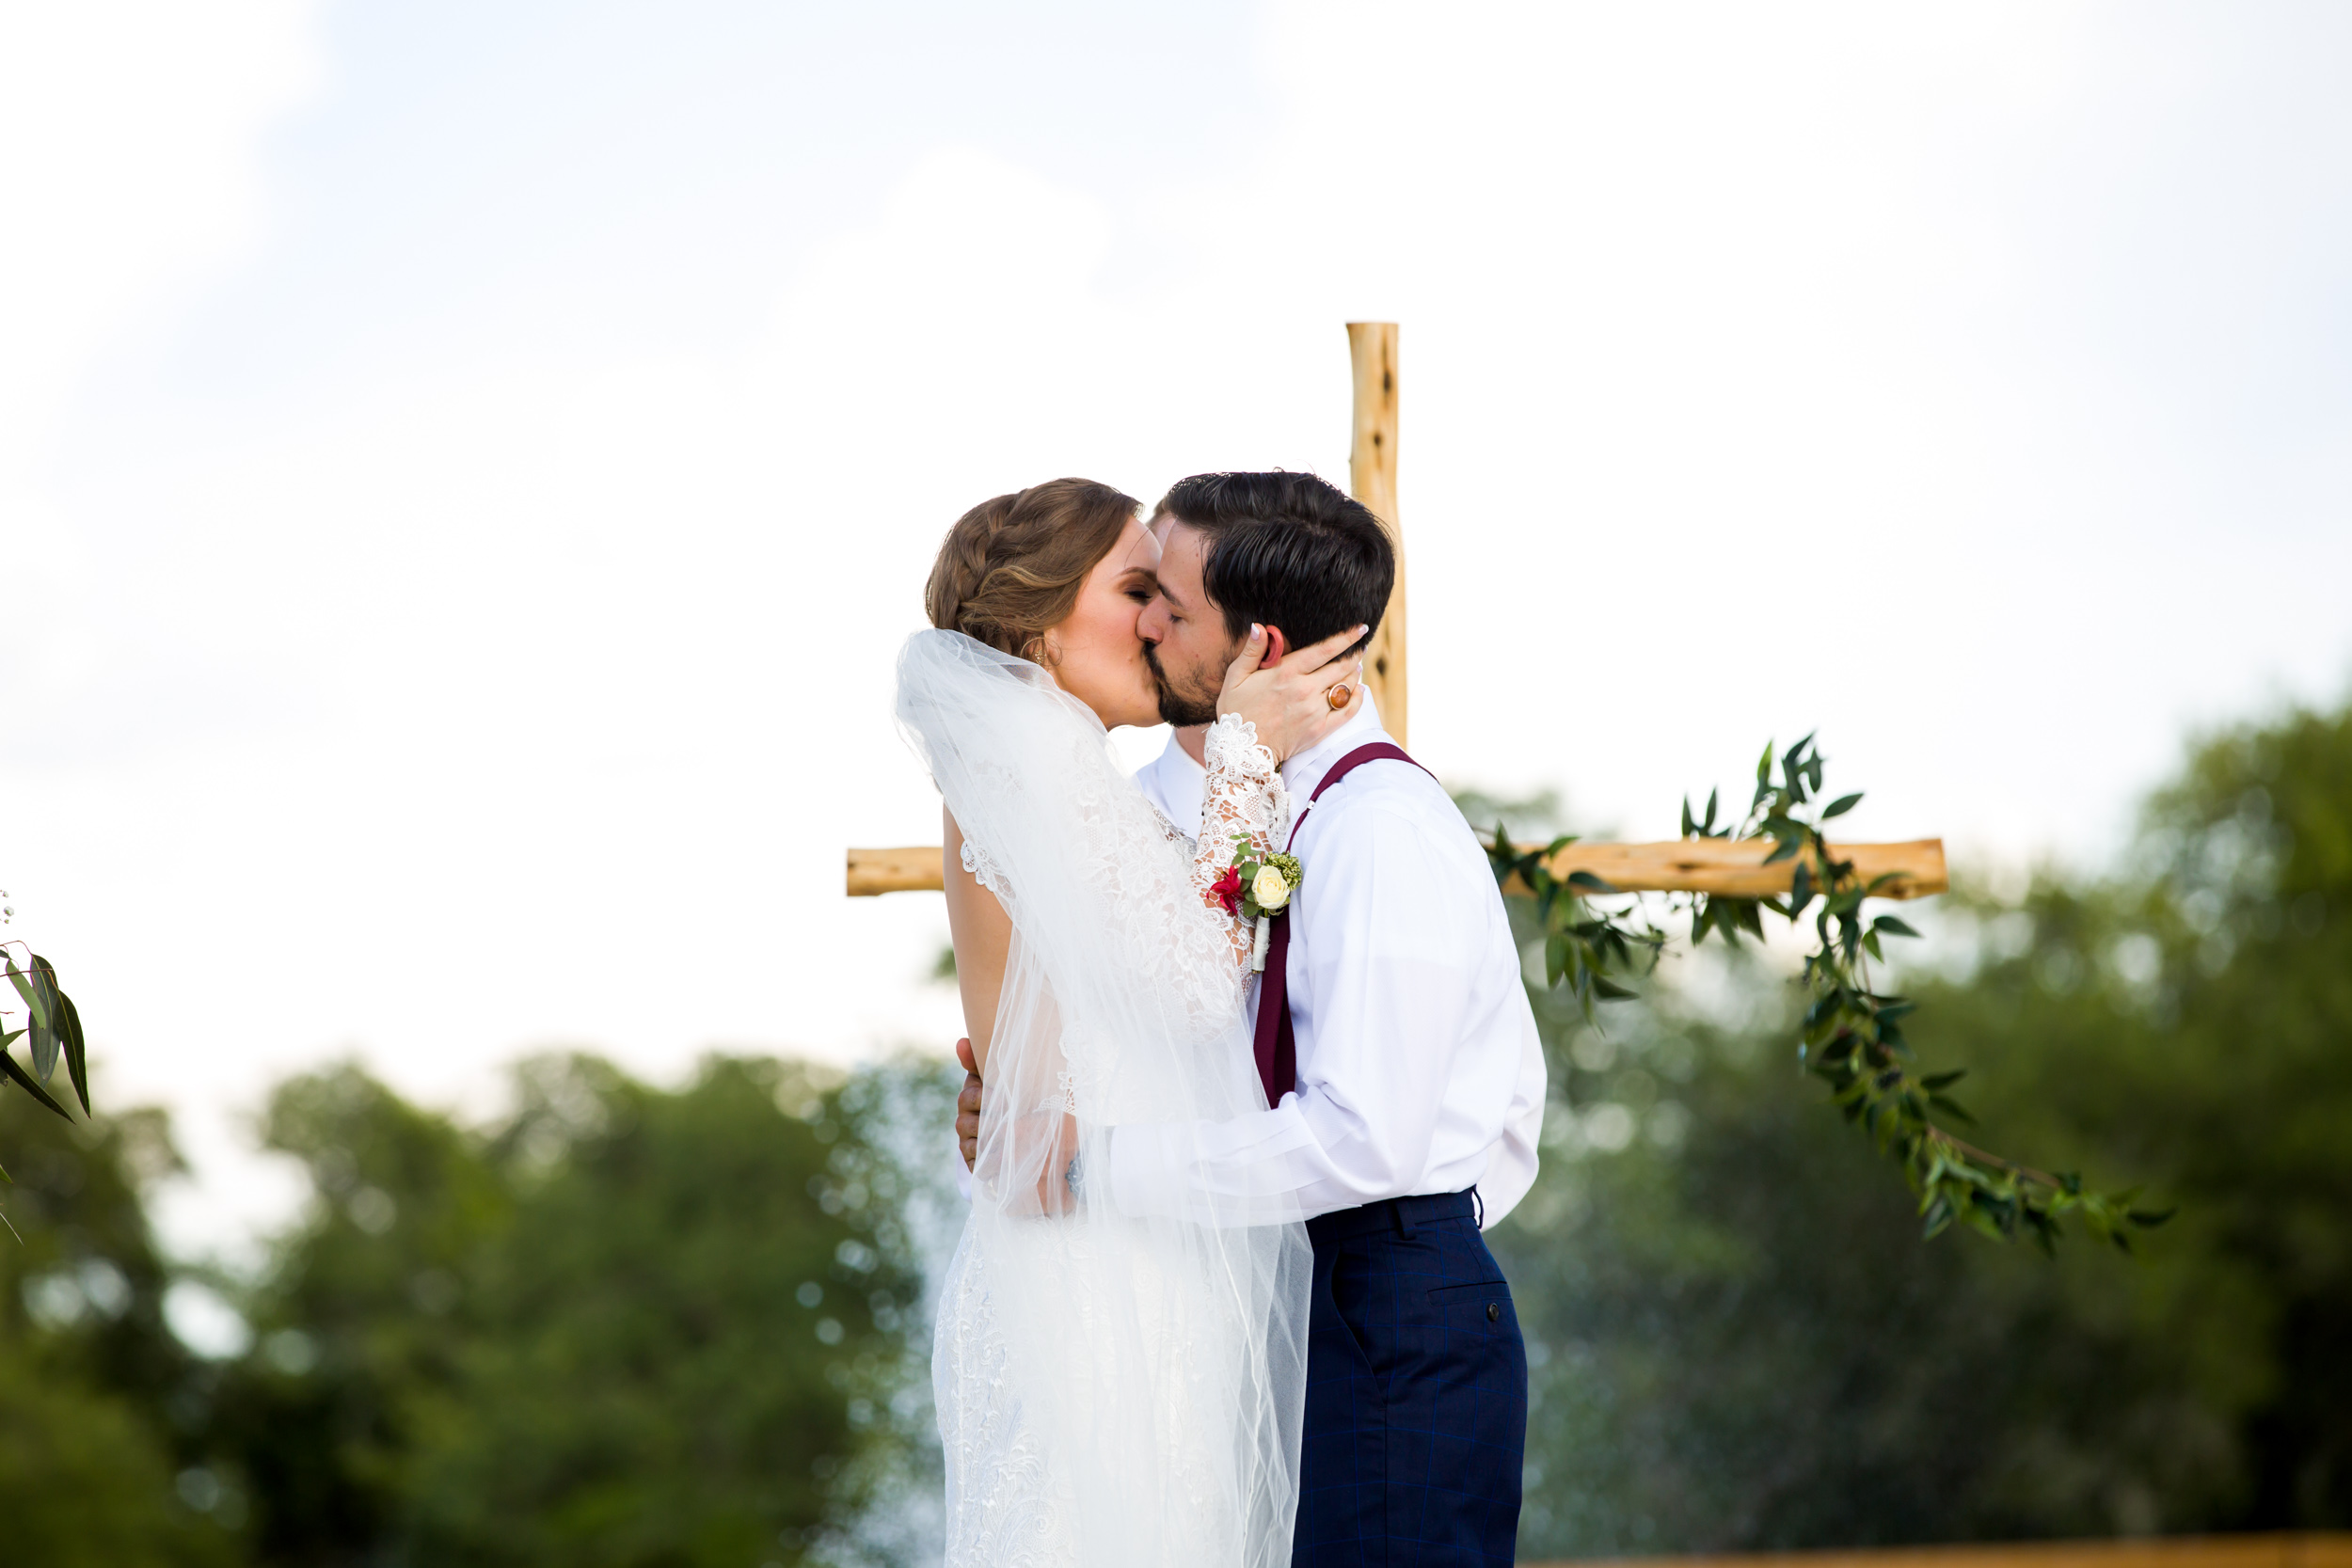 austin-wedding-colorful-33.jpg